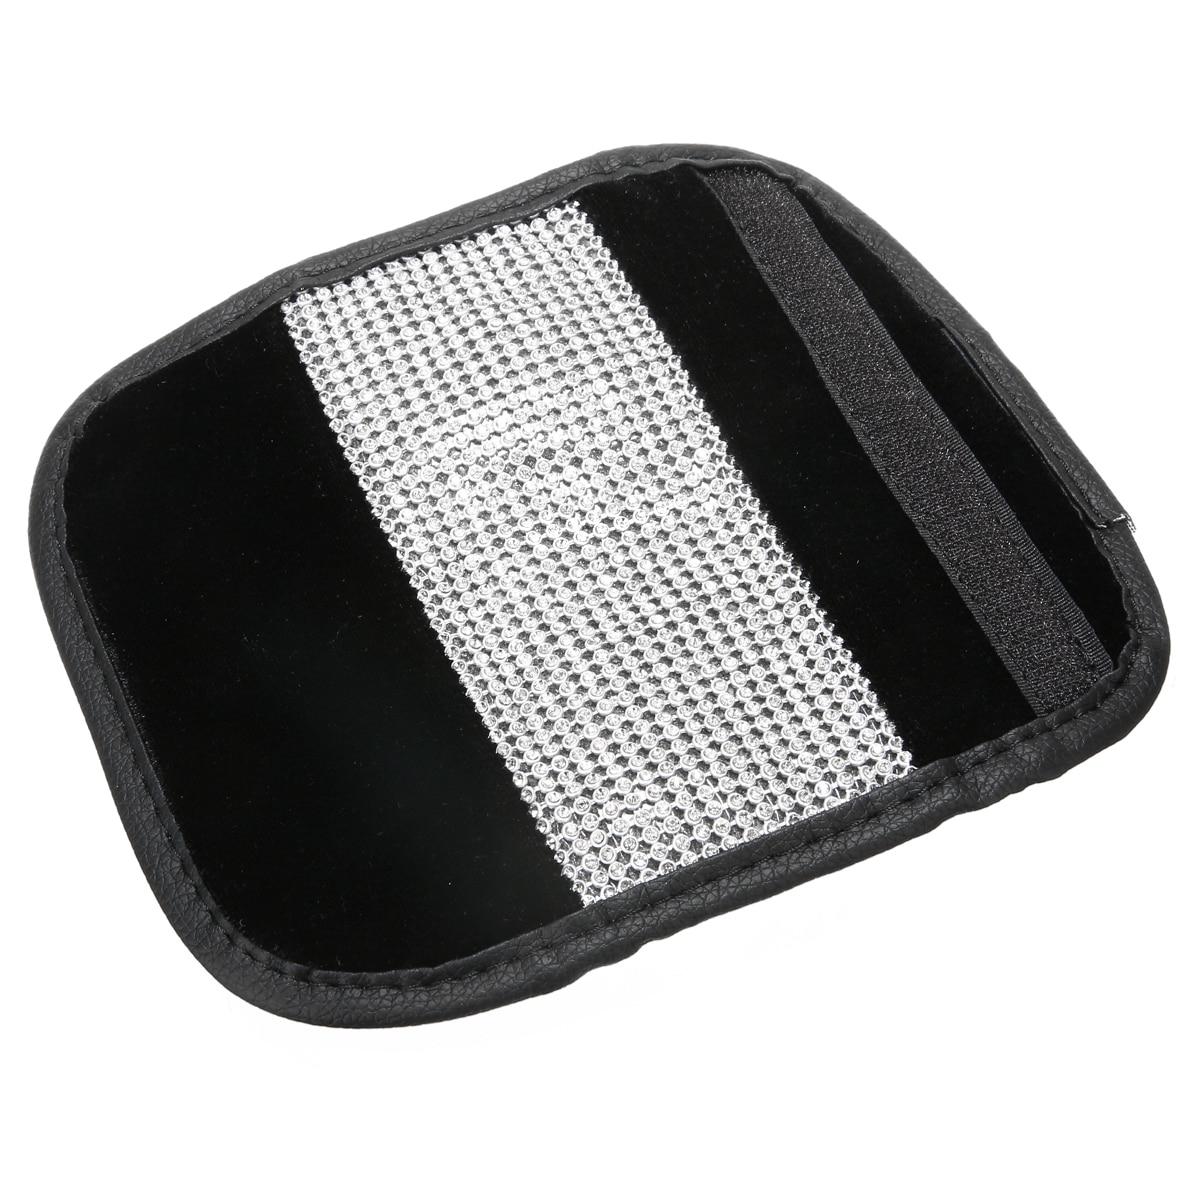 Universal 1pc Rhinestone Car Leather Handbrake Covers Gear Cover Auto Car Interior Protection Accessories